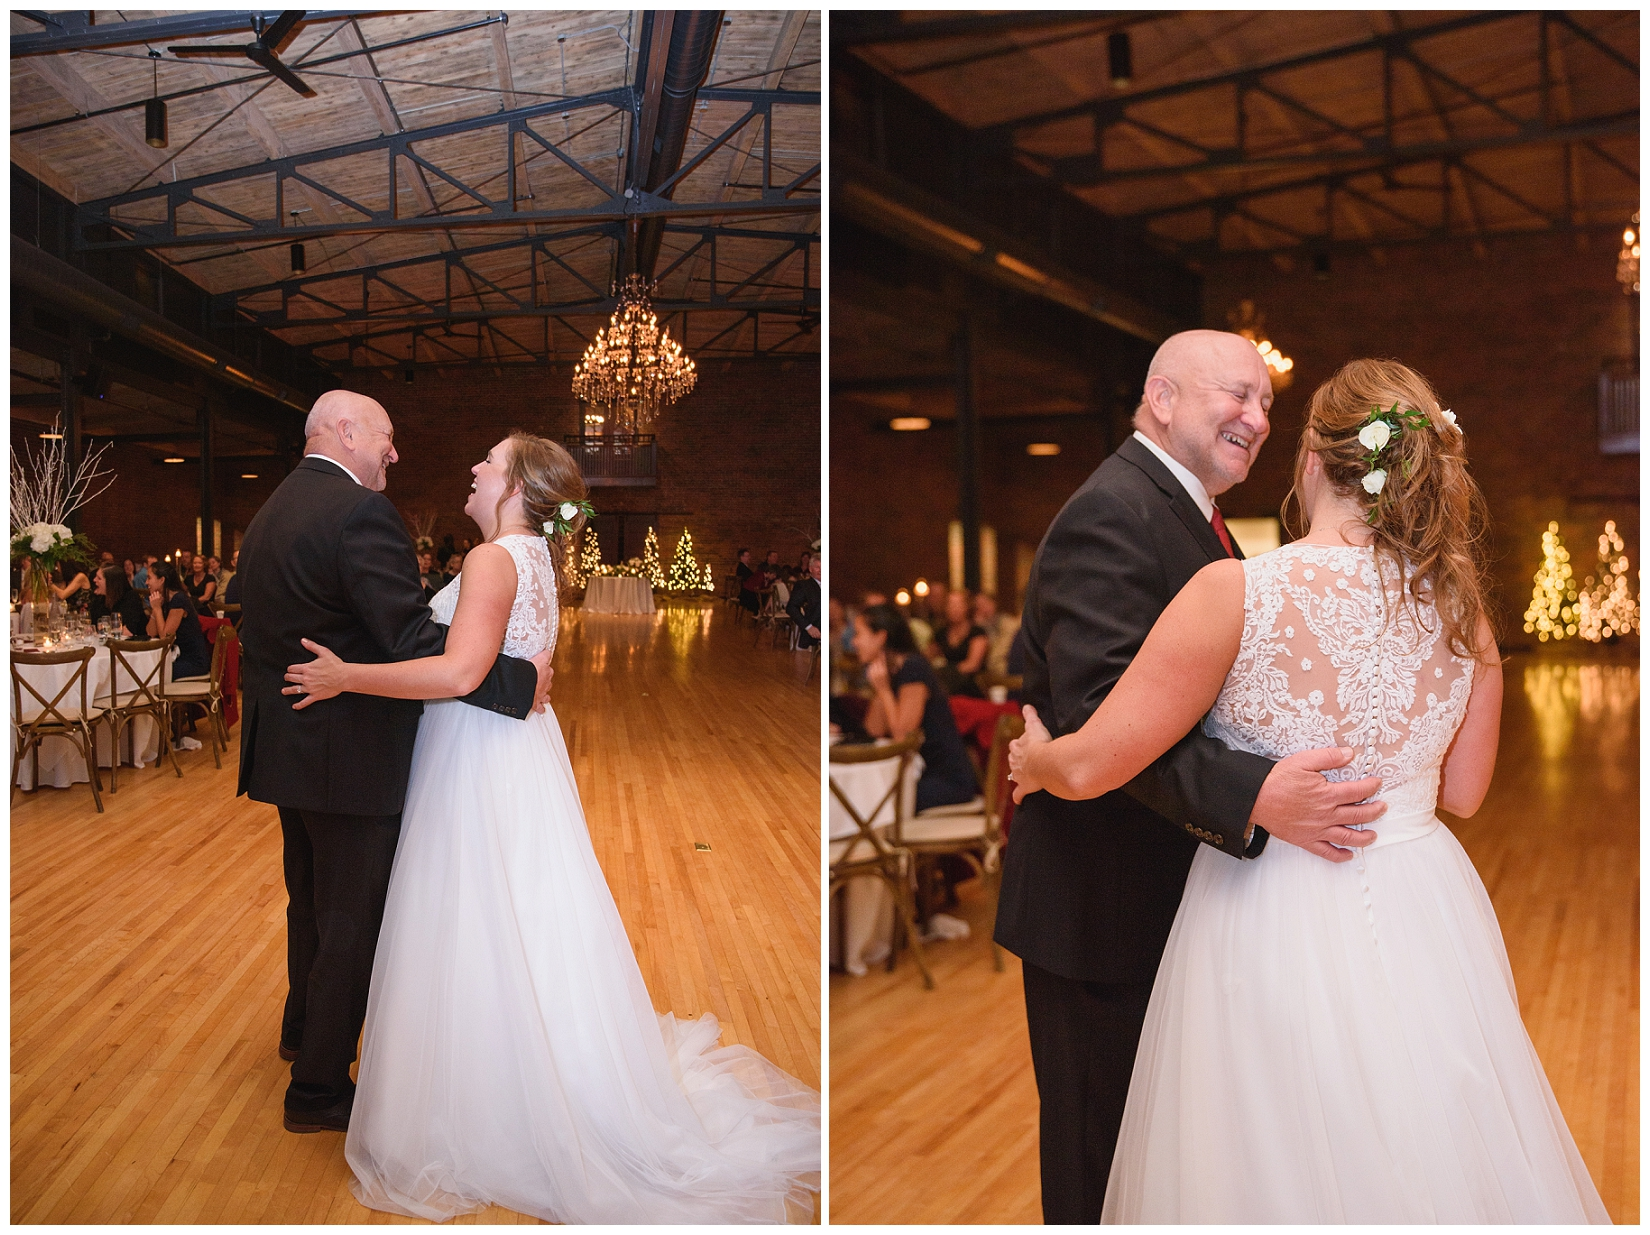 cat-alkire-wedding-photographer-indiana-chicago-indianapolis-fort-wayne_1003.jpg